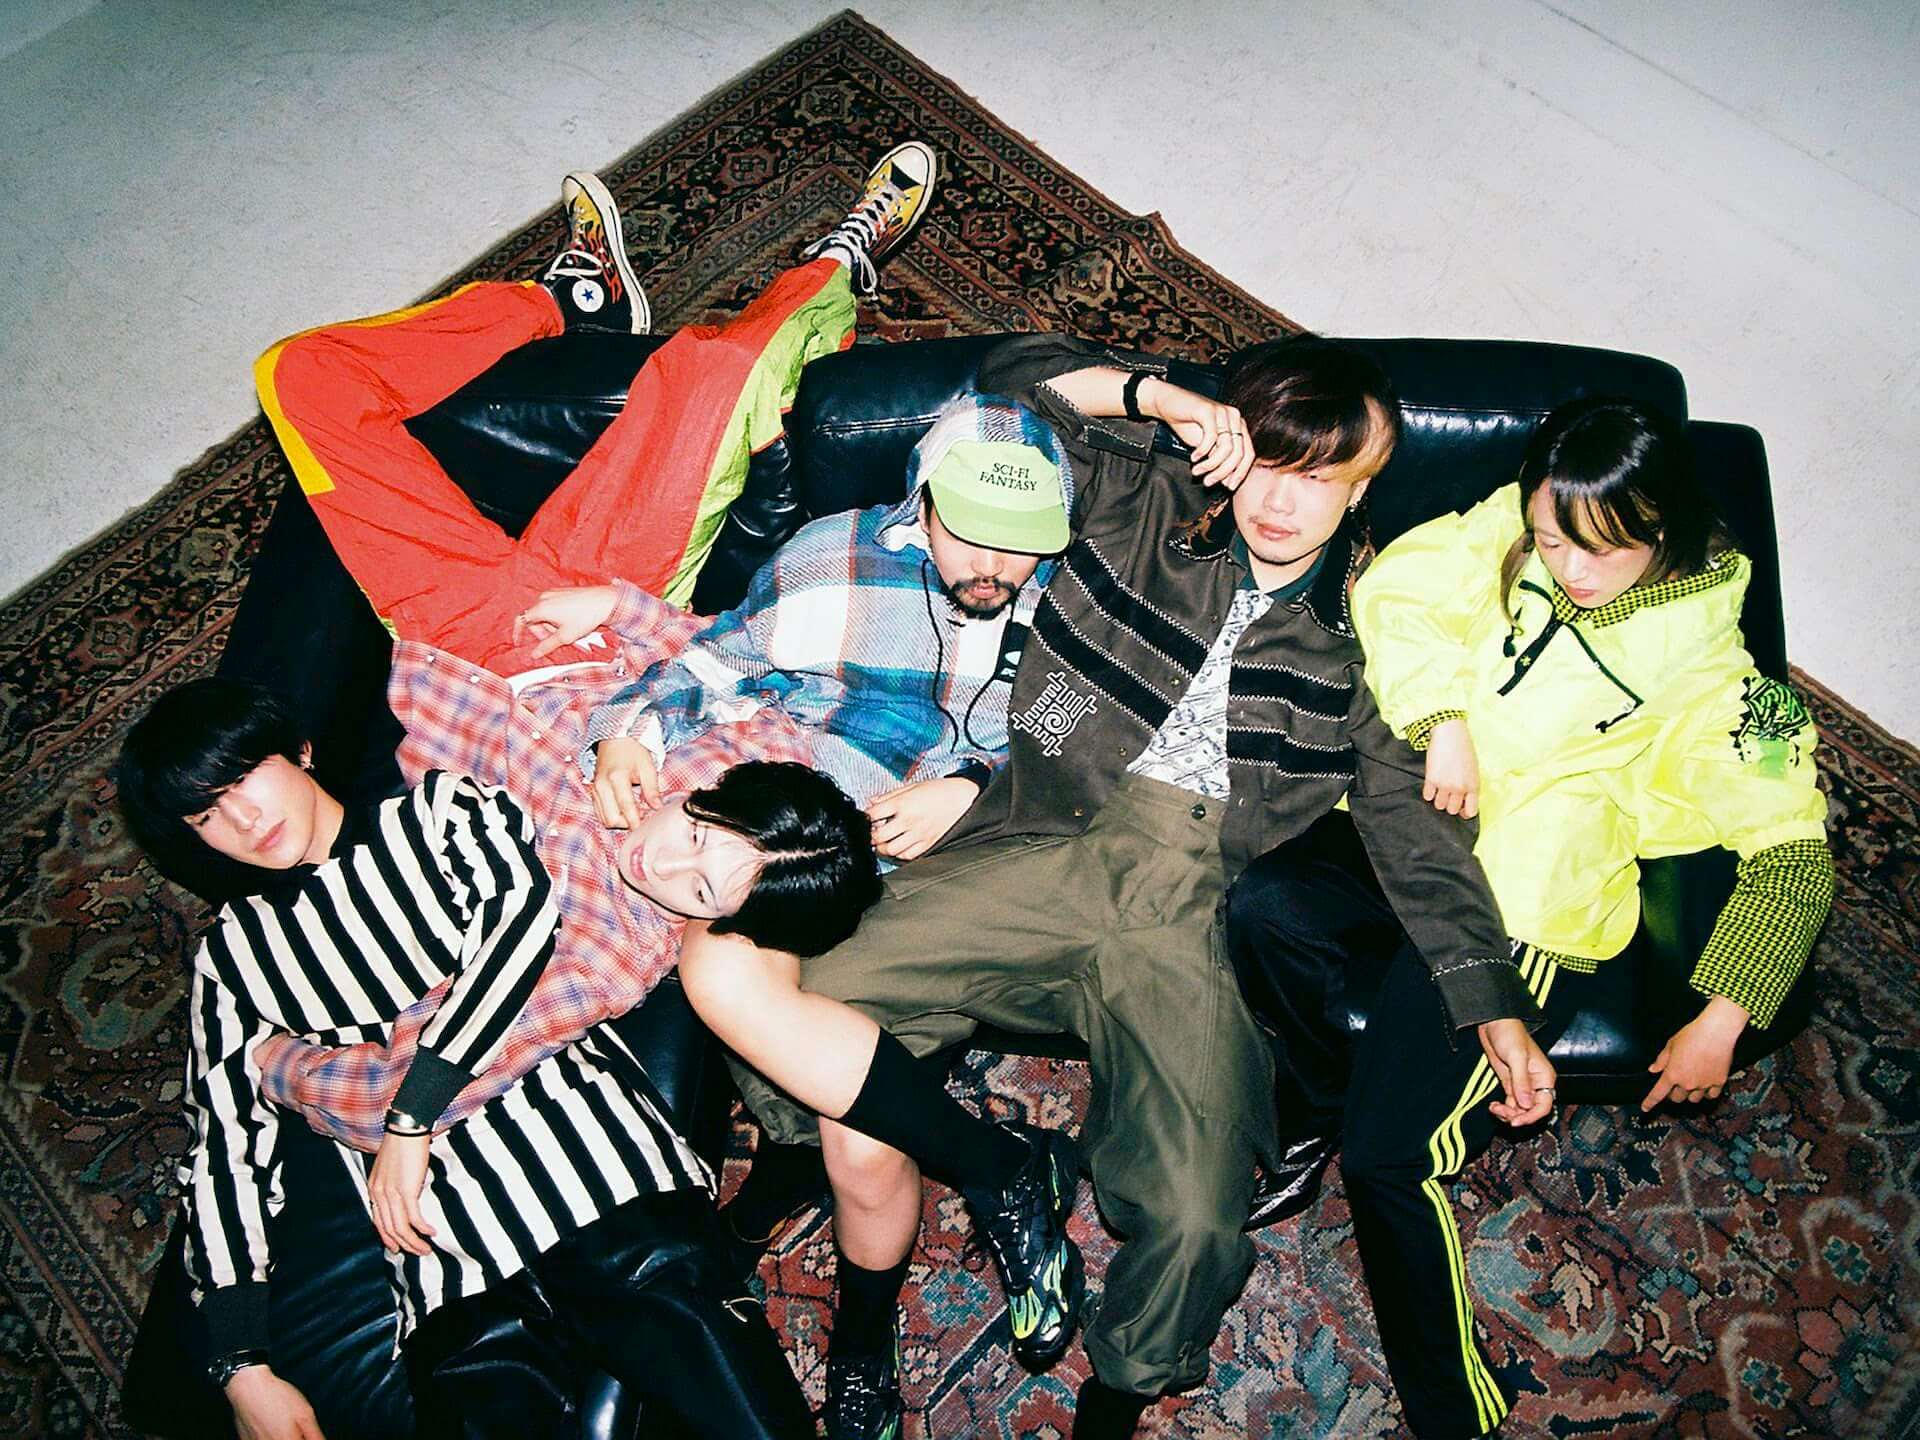 "gatoの最新シングル""dada""が配信開始&MVも公開!バンド初のフルアルバム『BAECUL』もリリース決定 music200903_gato_5-1920x1440"